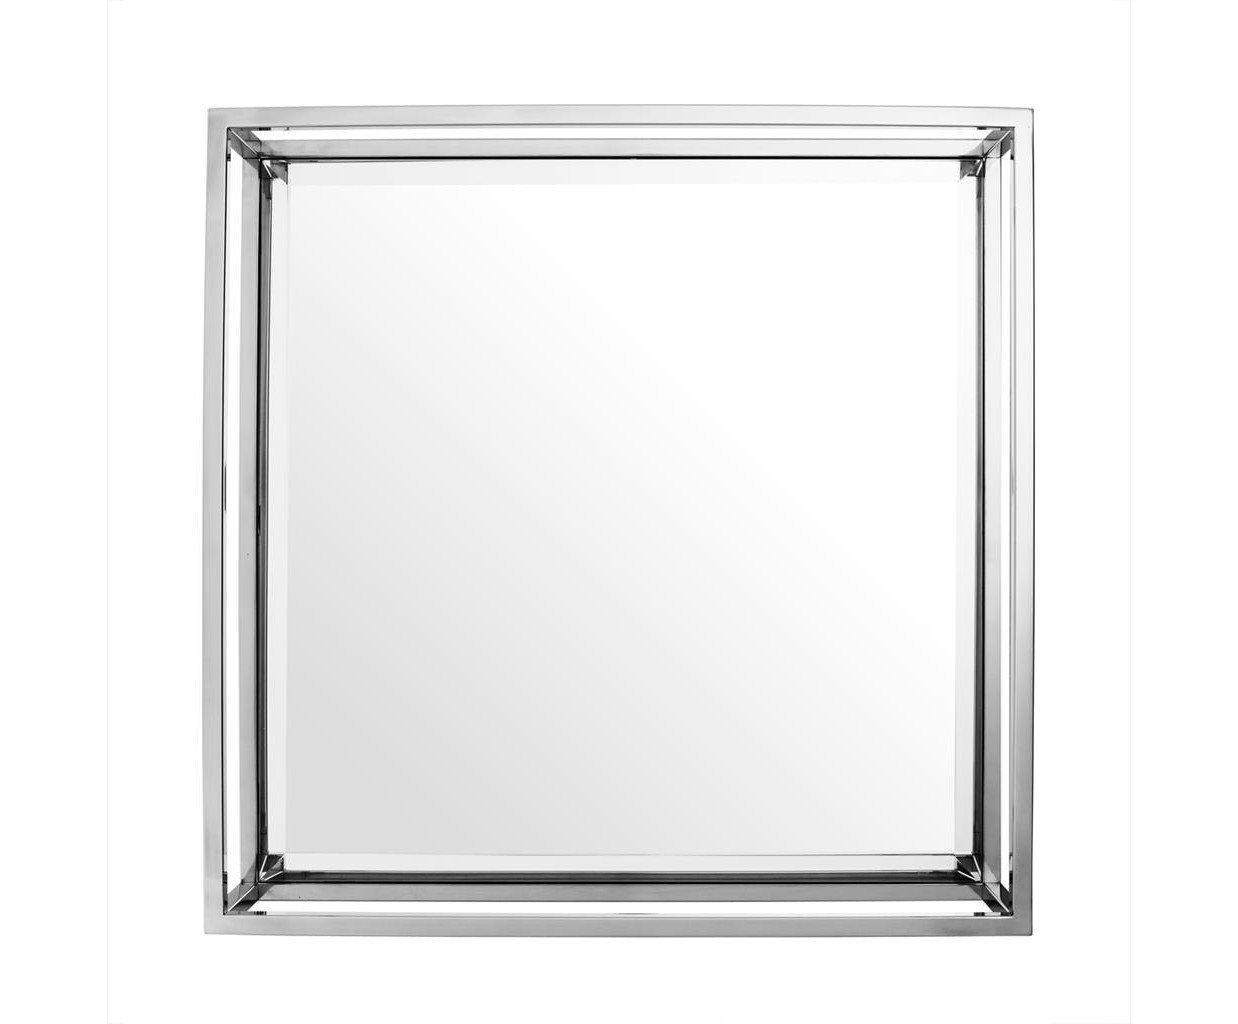 ЗеркалоНастенные зеркала<br>Зеркало Mirror Cromwell в рама из полированной нержавеющей стали.<br><br>Material: Сталь<br>Ширина см: 60<br>Высота см: 60<br>Глубина см: 15